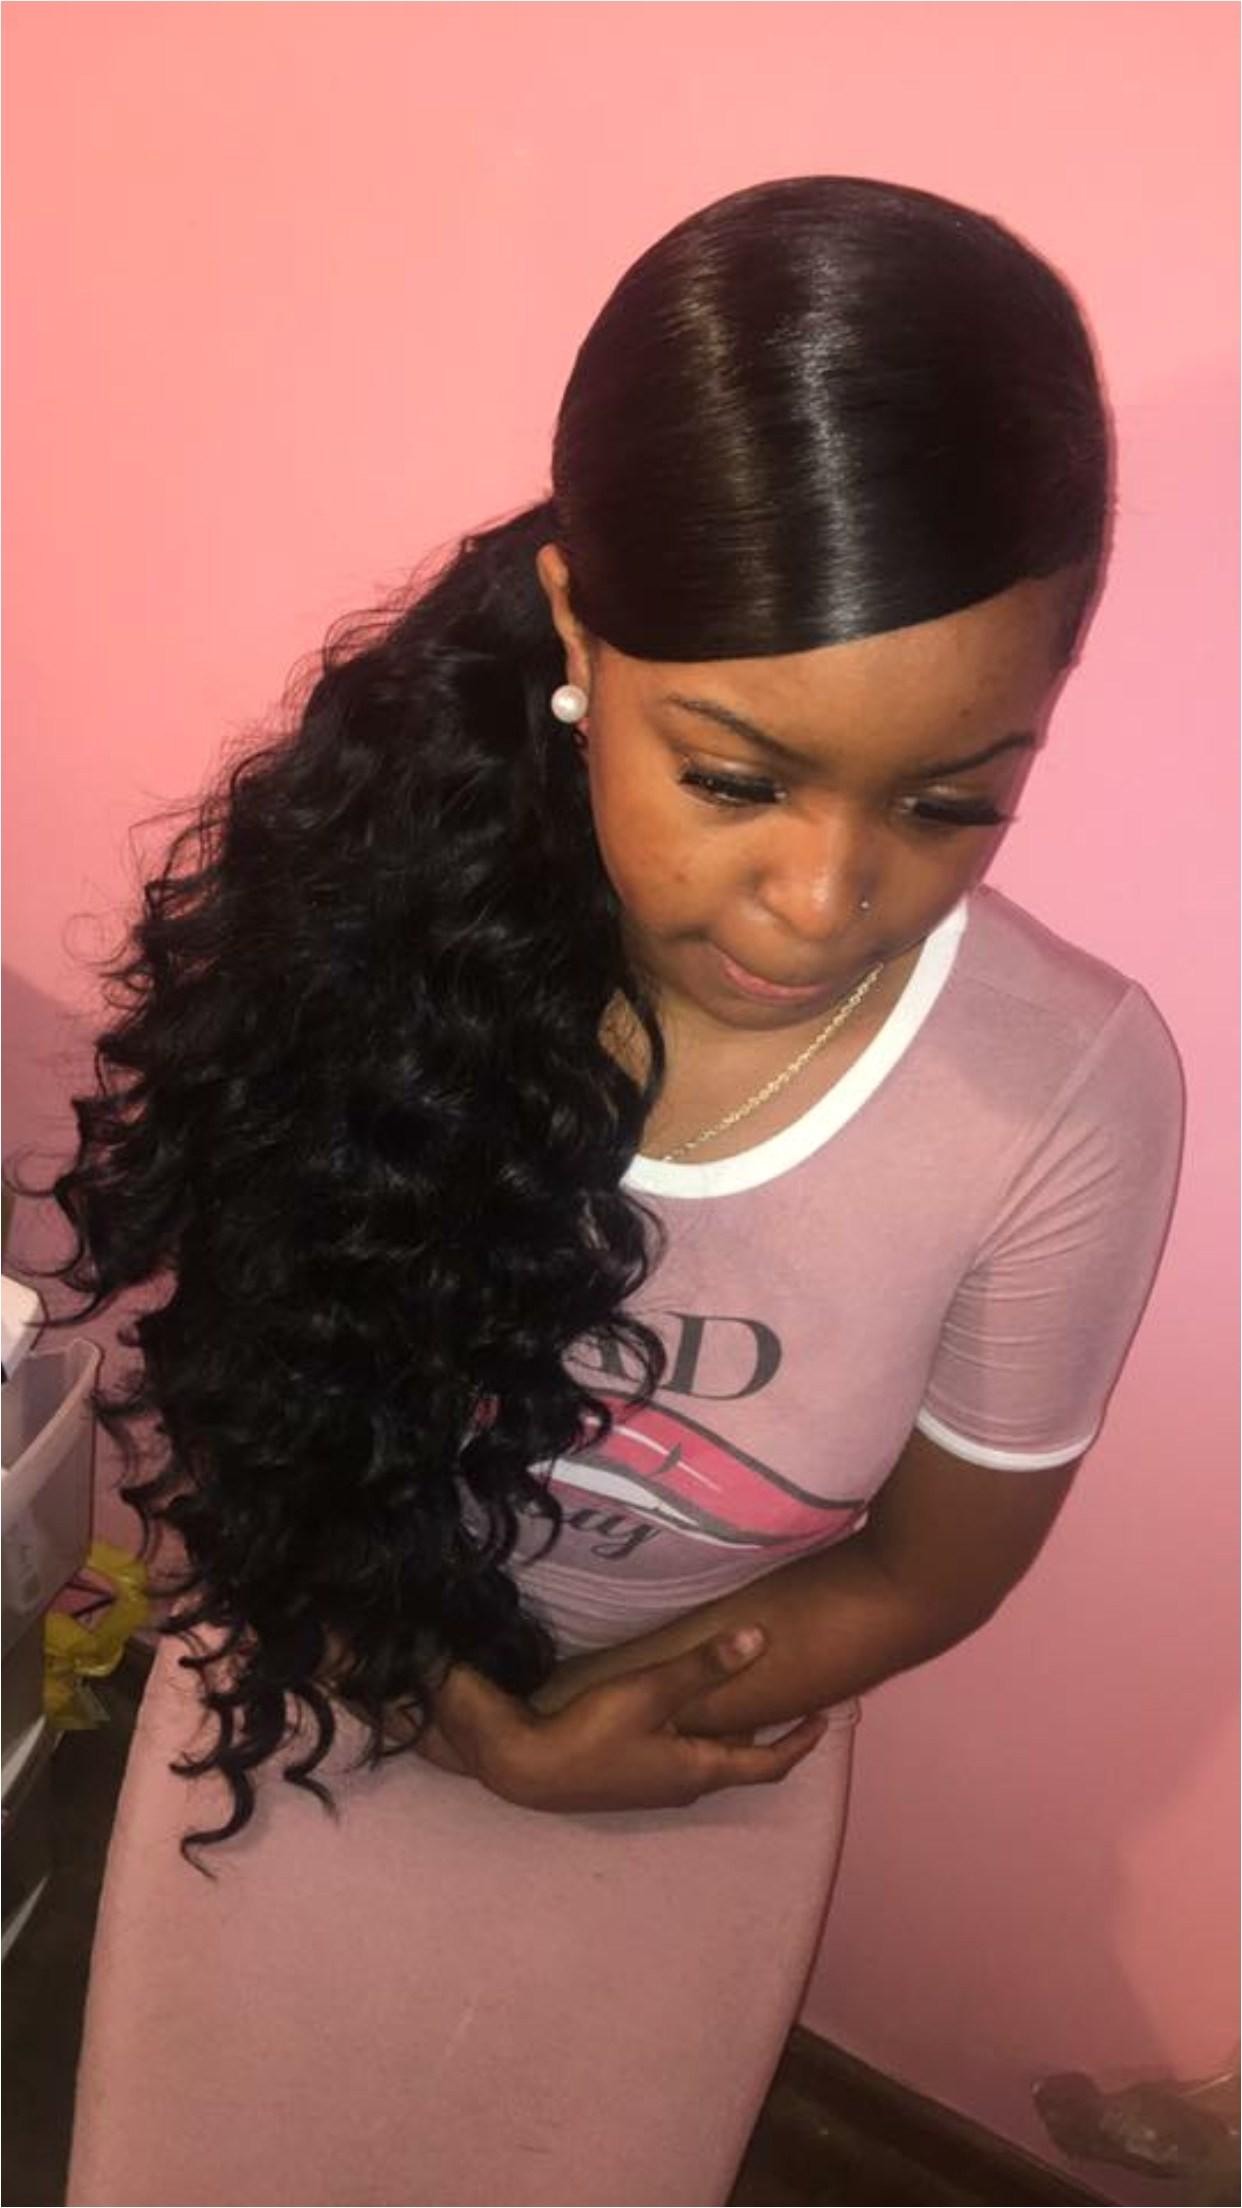 American Girl Doll Hair Styles Fresh American Girl Doll Hairstyles Luxury Best Black Baby Girl Hairstyles